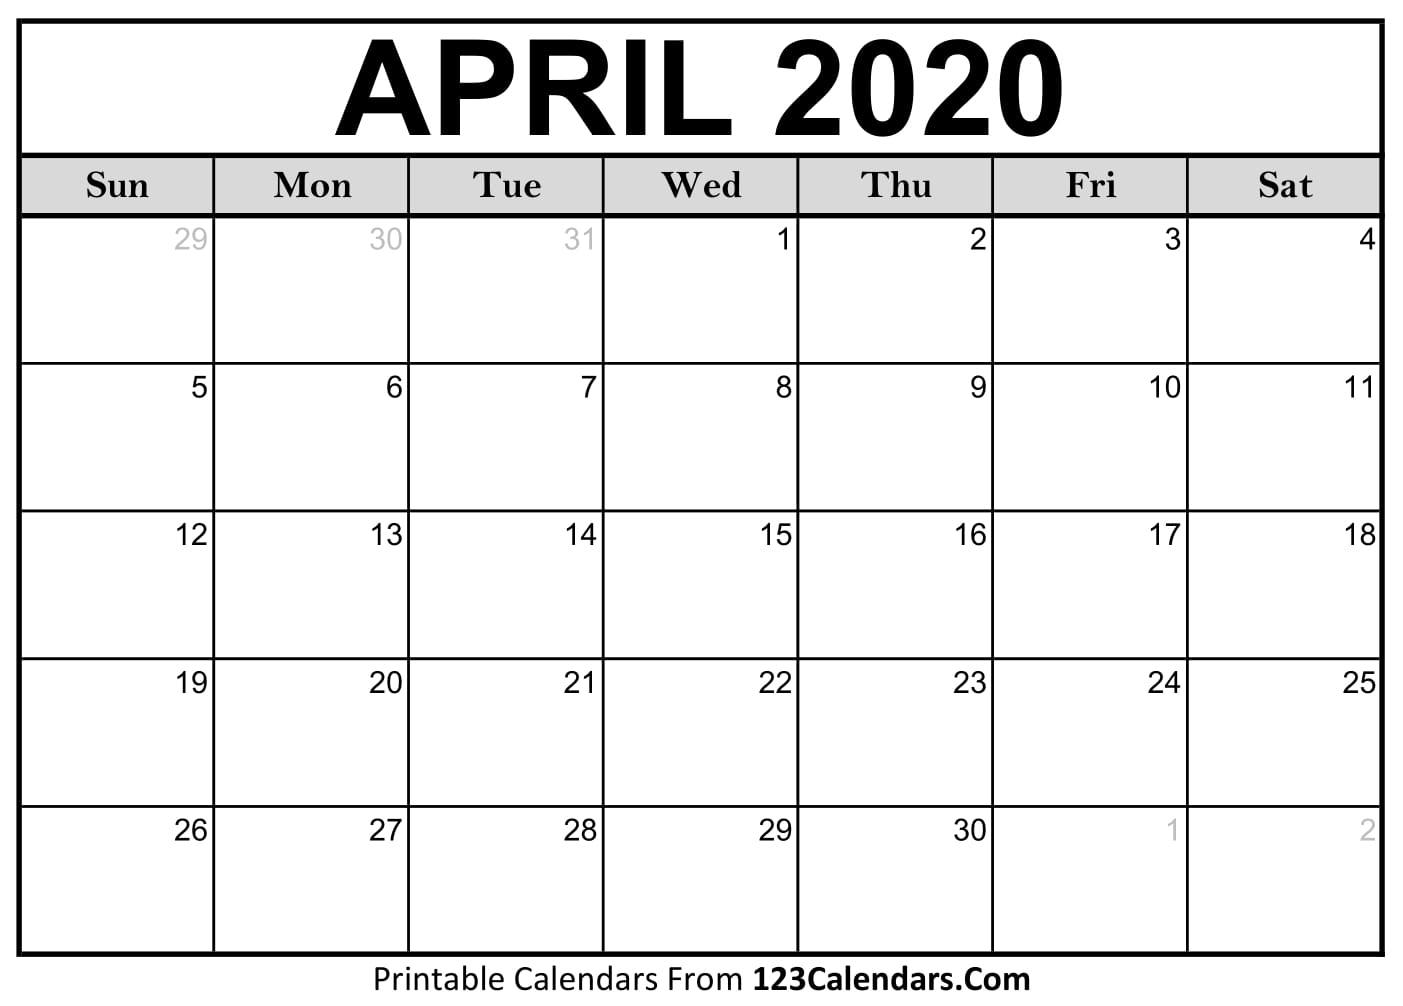 April 2020 Printable Calendar   123Calendars